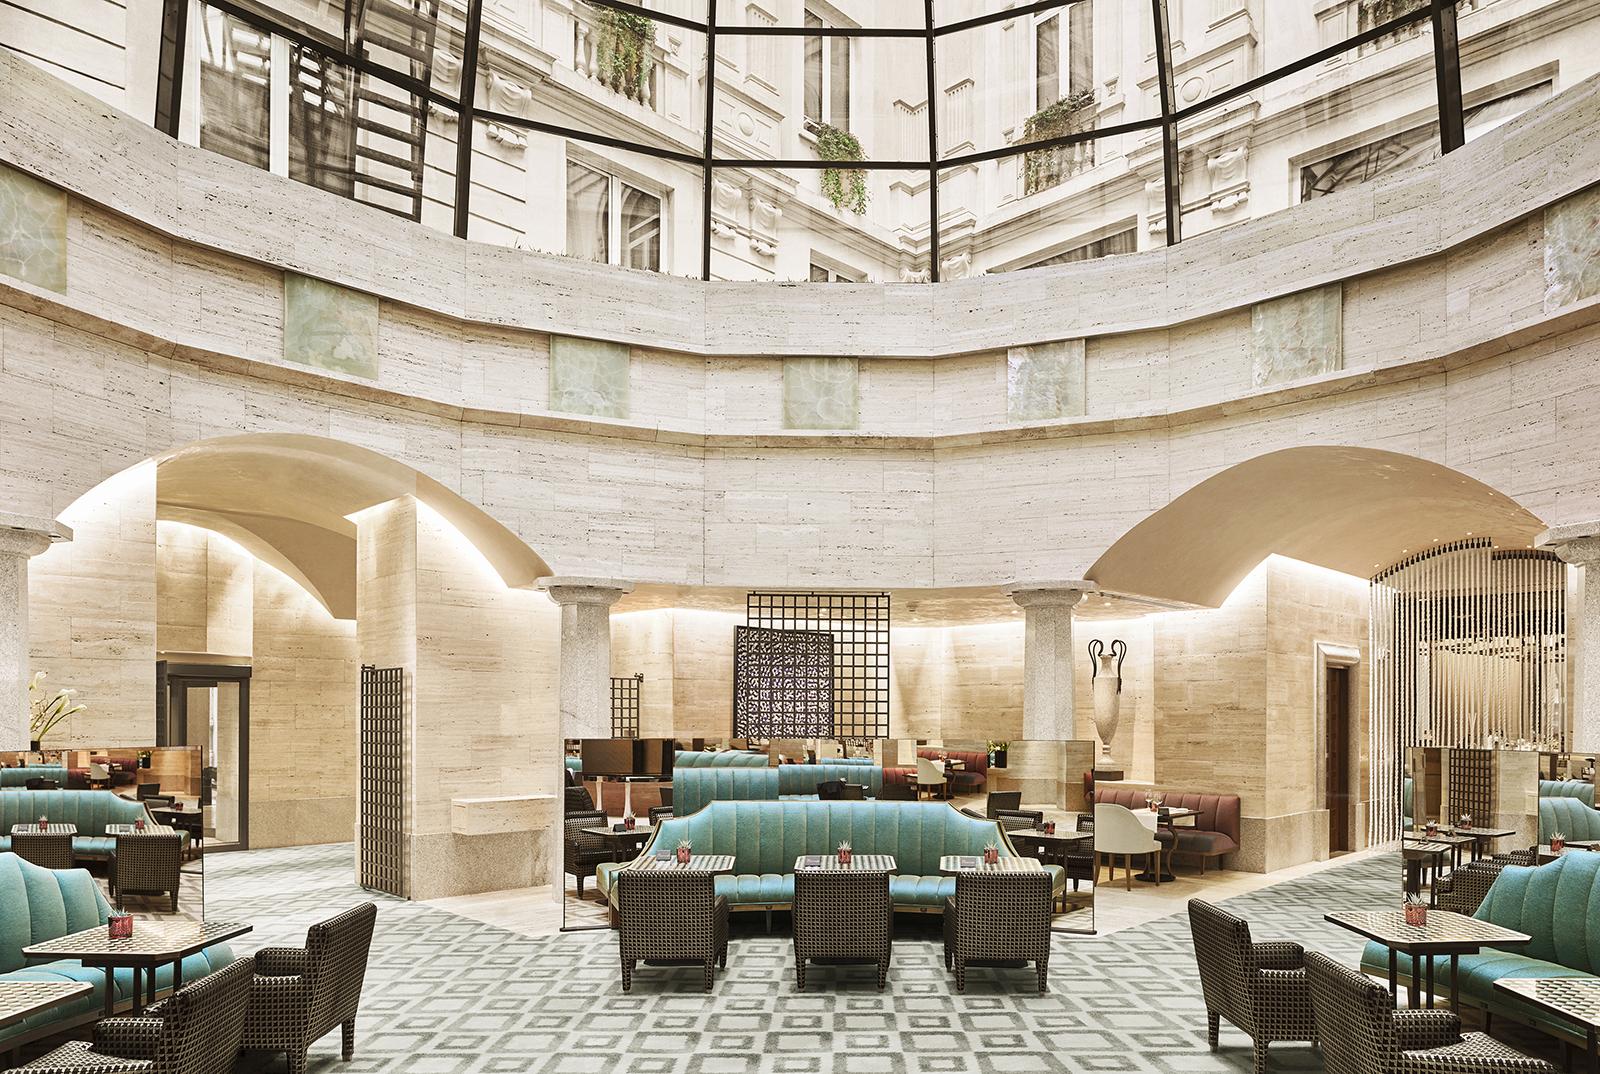 Elegant lounge below majestic cupola